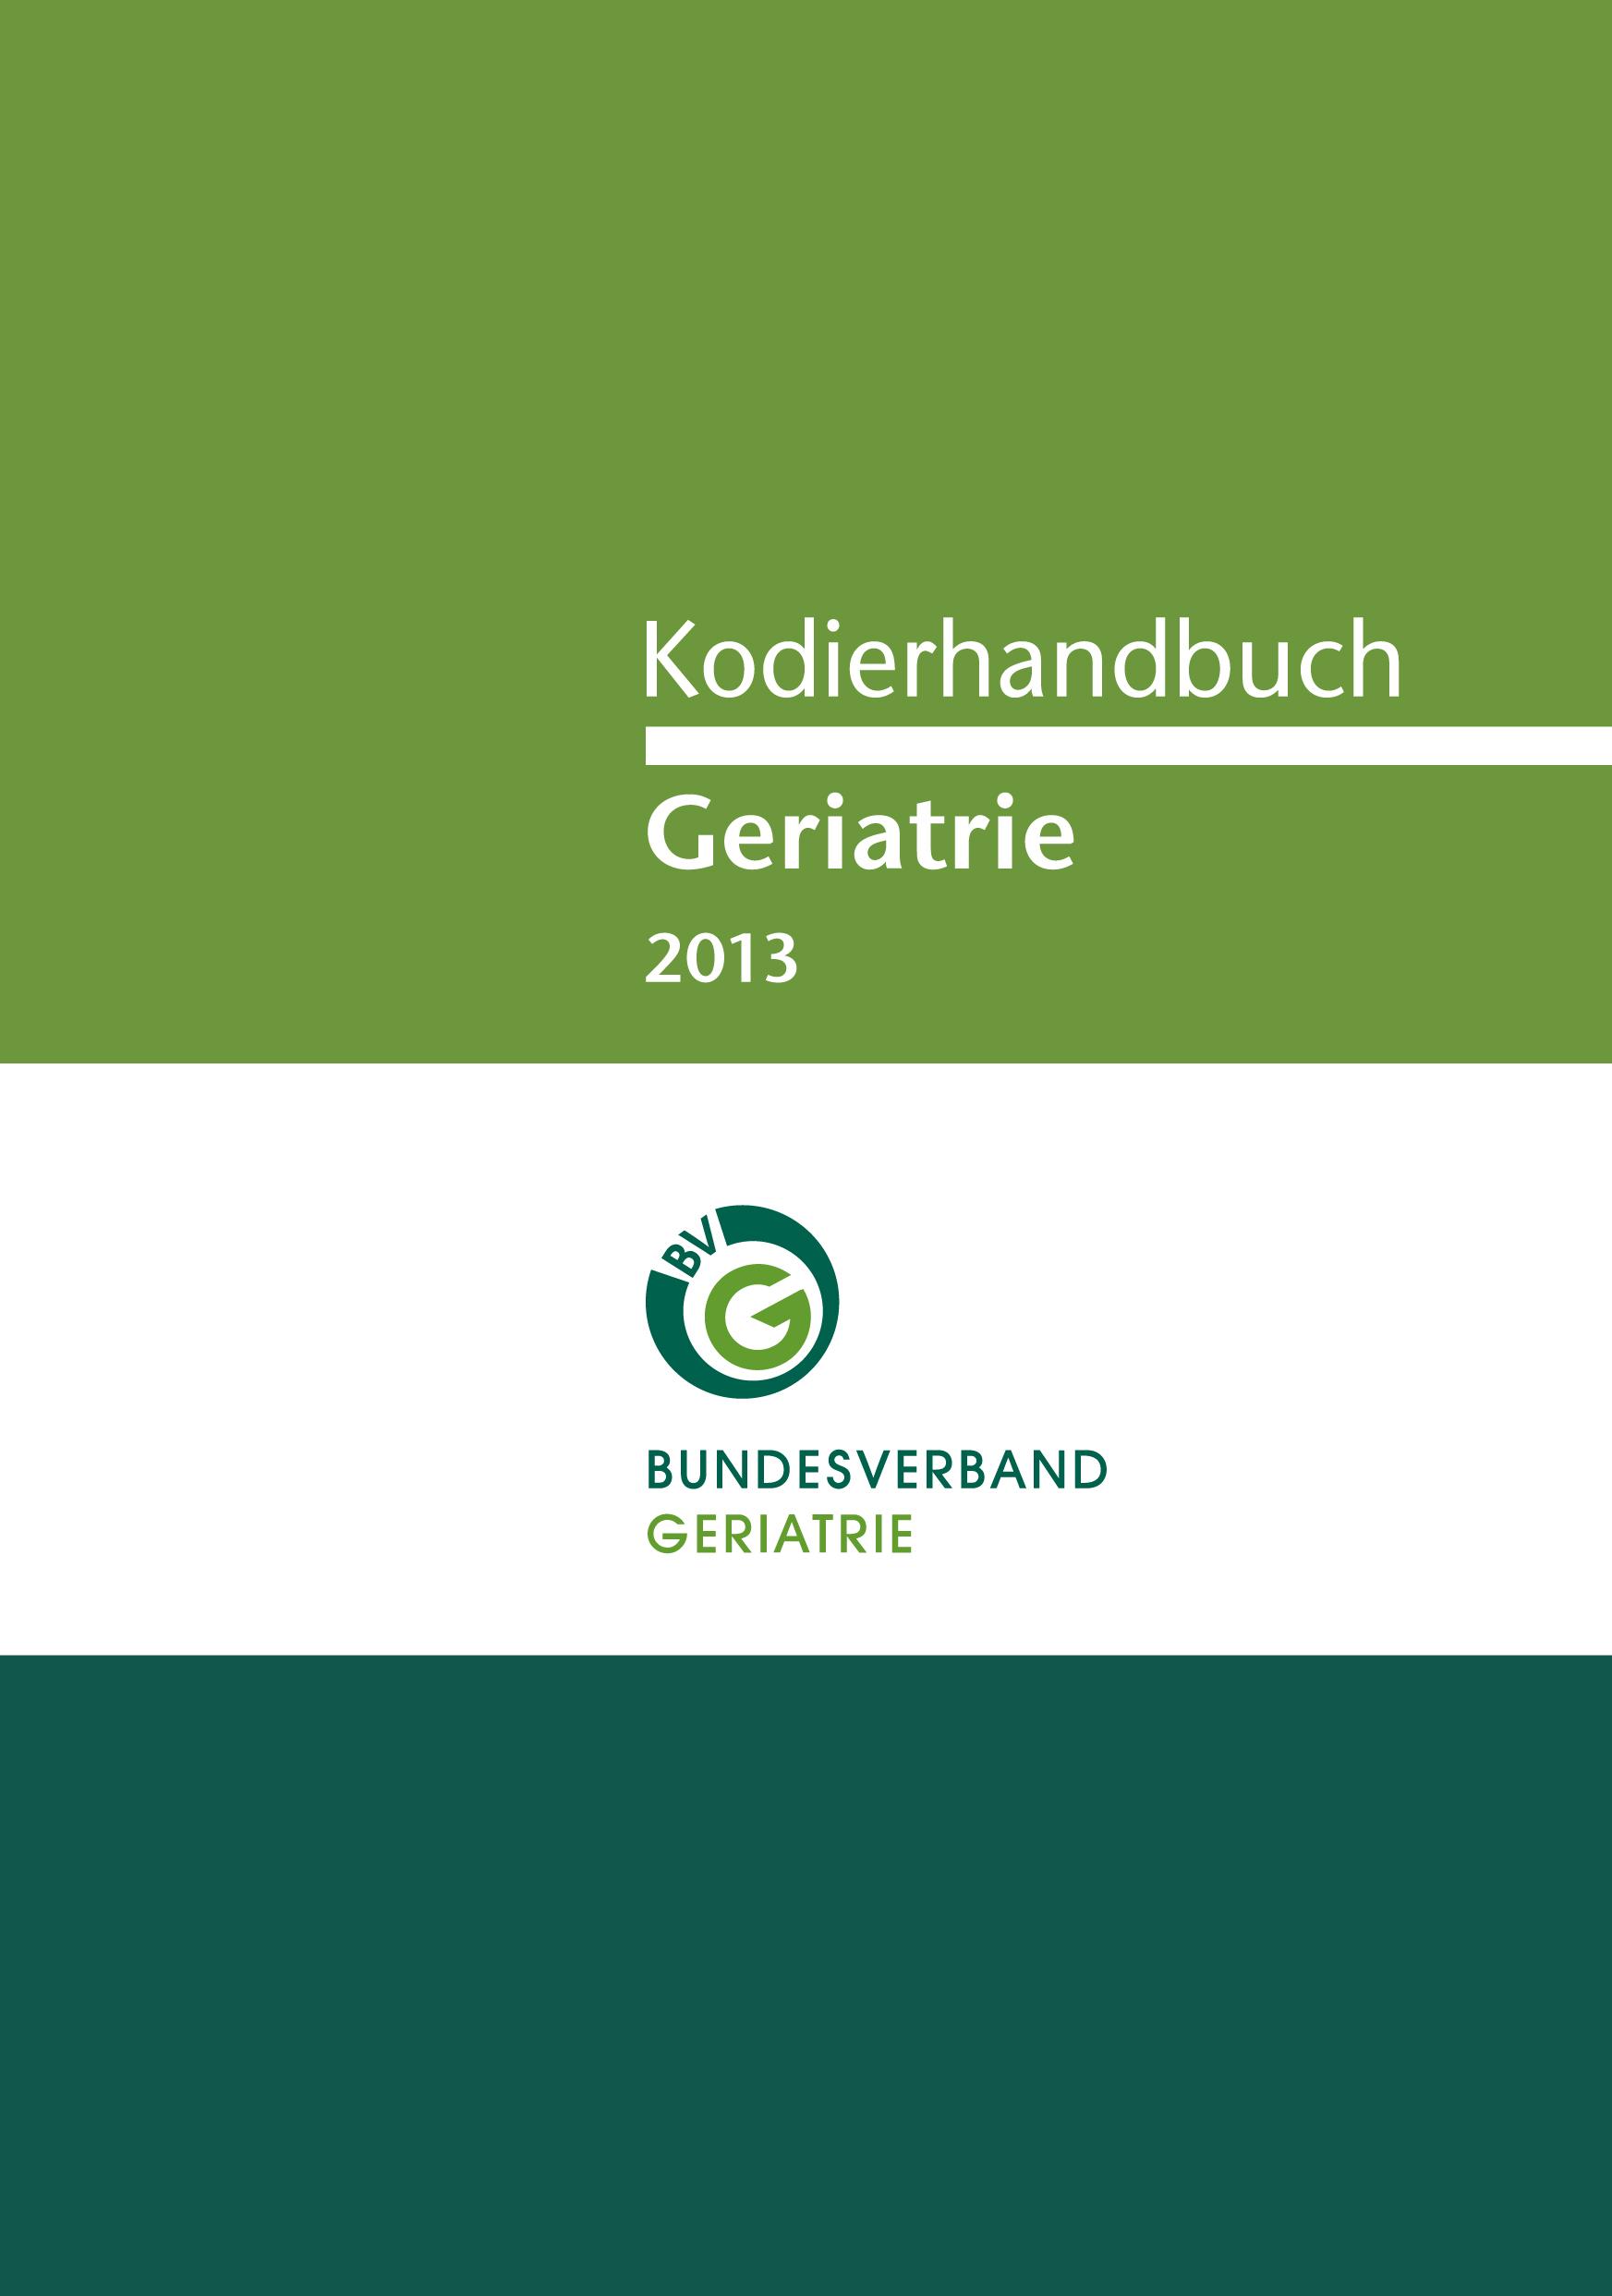 Kodierhandbuch Geriatrie 2013